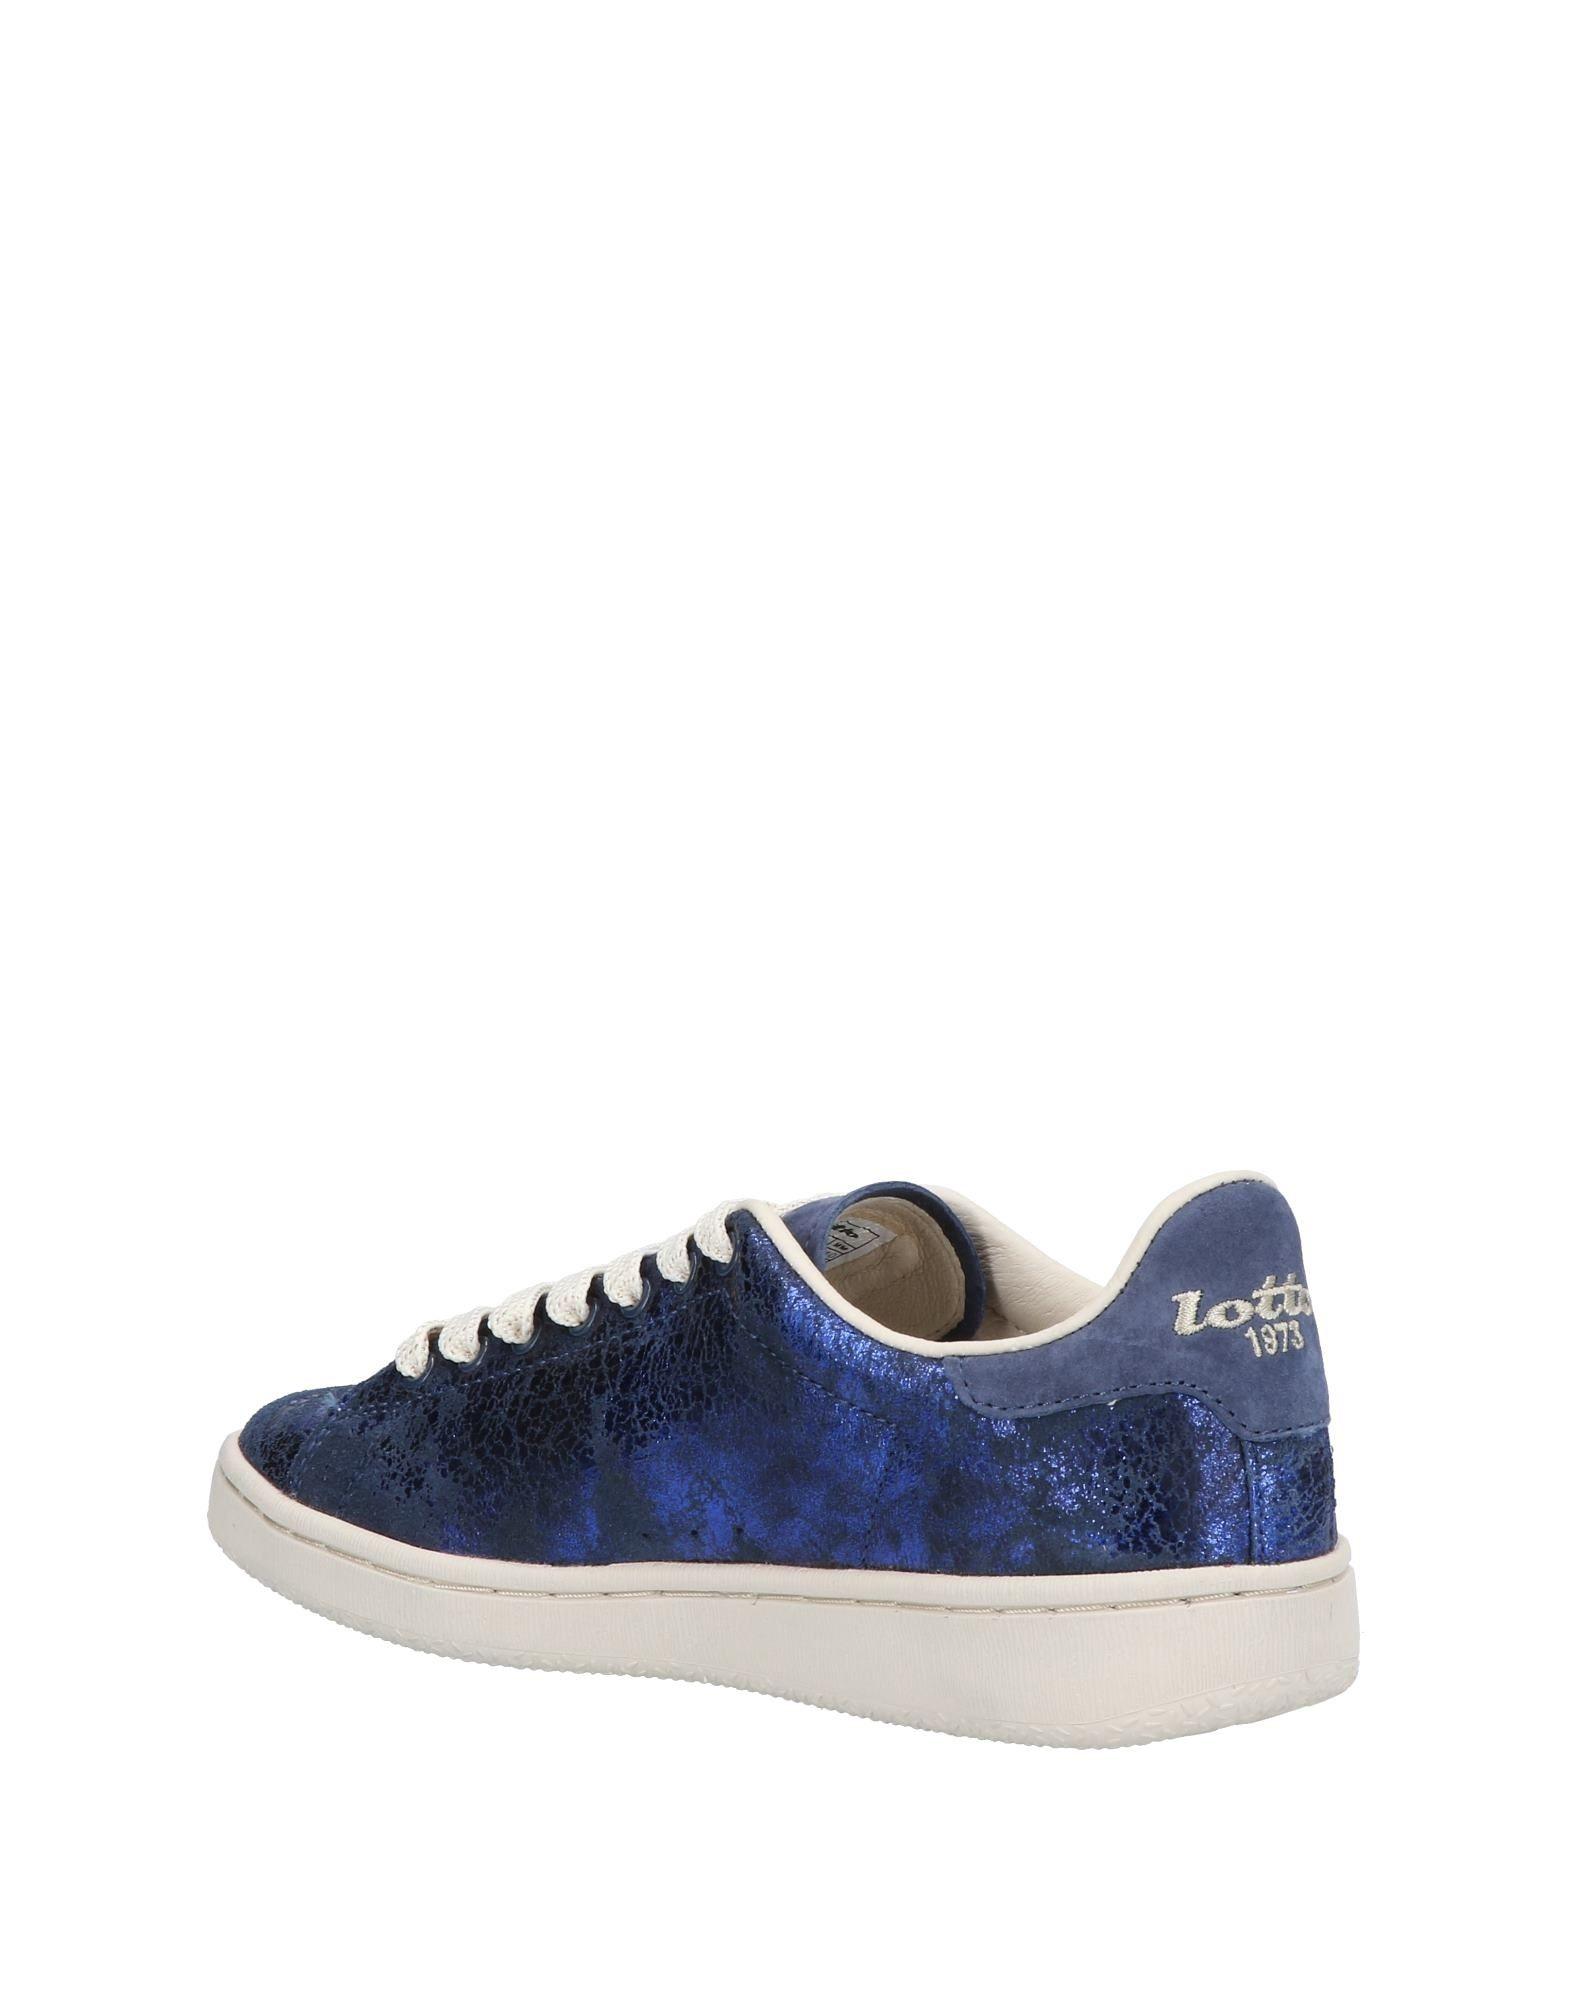 Lotto Leggenda Sneakers Damen  11452655KV Gute Qualität beliebte beliebte beliebte Schuhe 615387